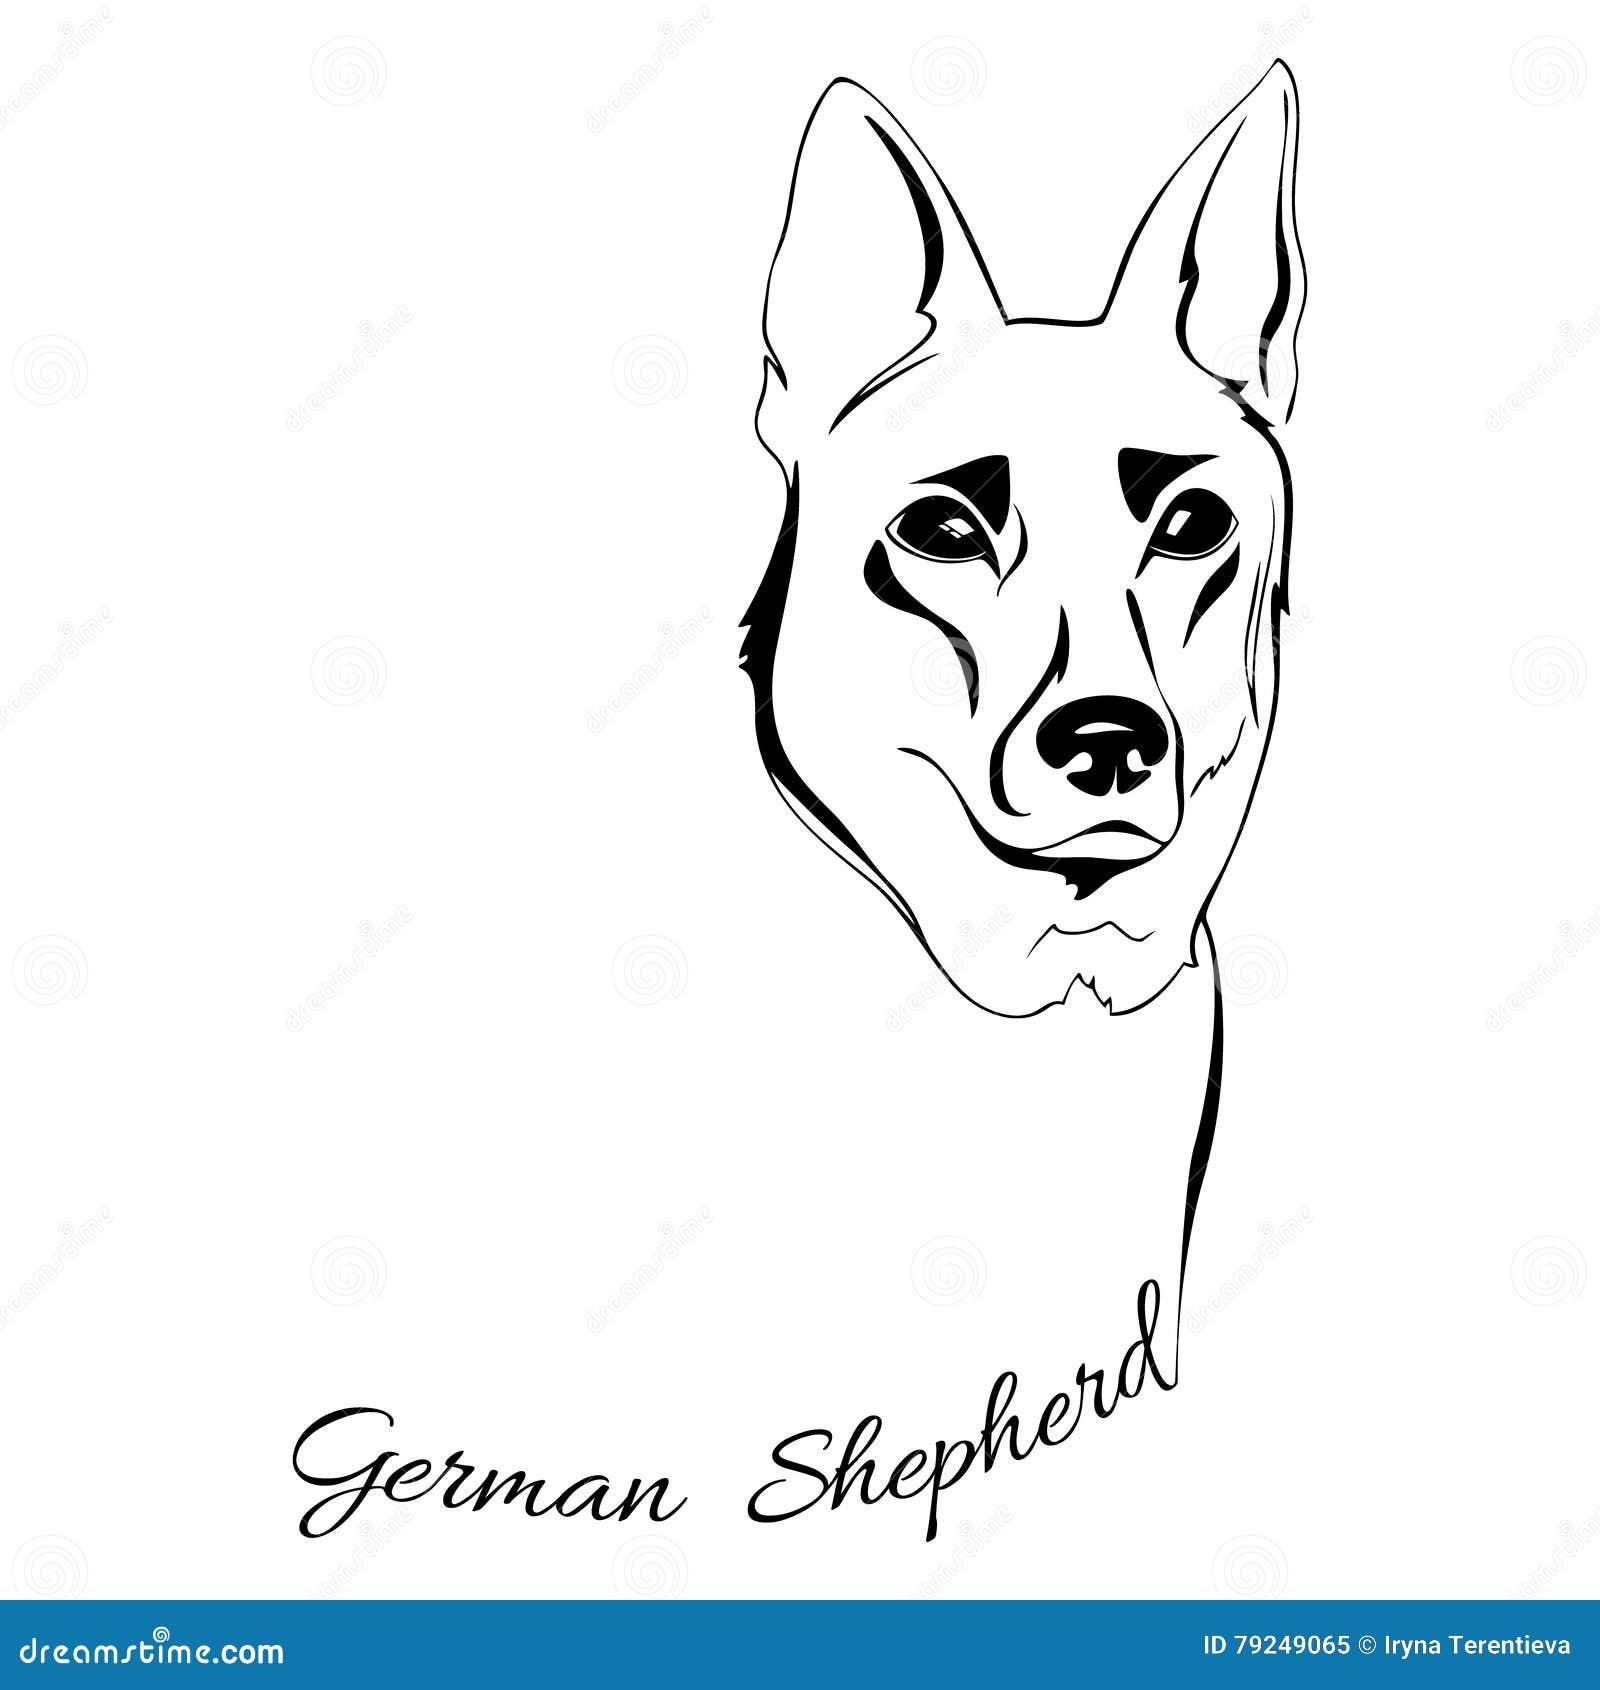 German Shepherd Dog Head Stock Vector Illustration Of Card 79249065